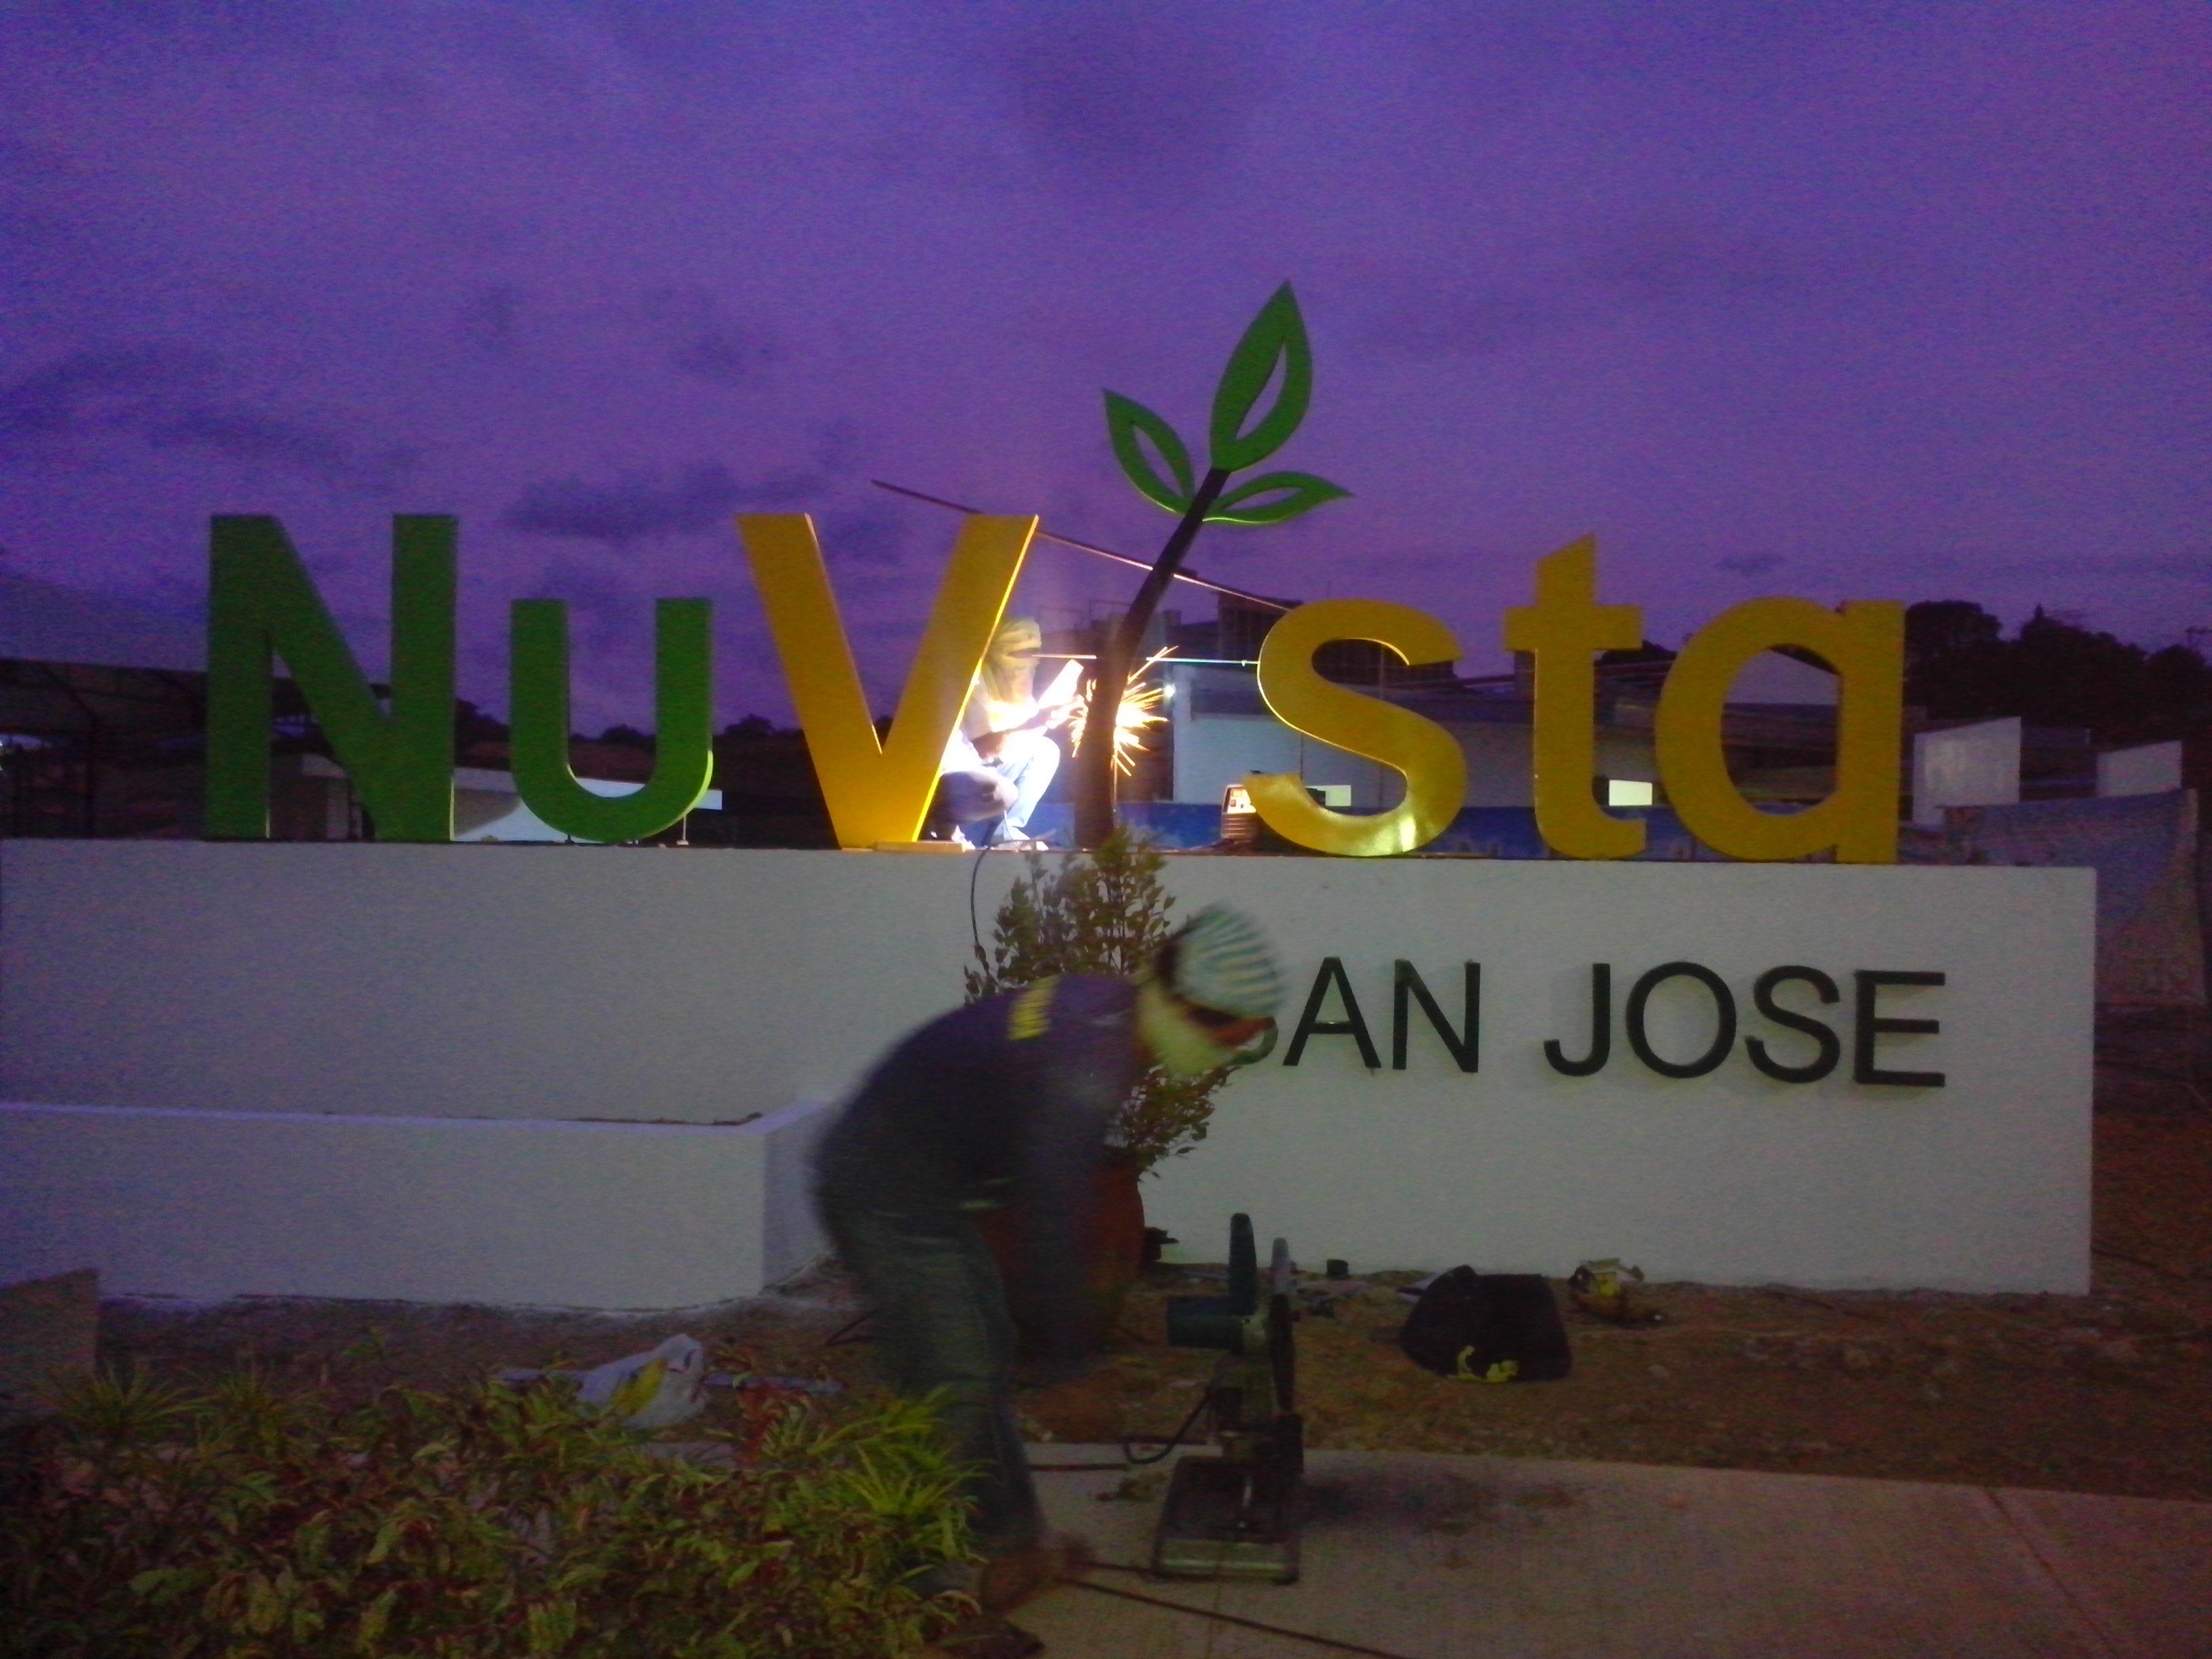 Nuvista San jose San Jose